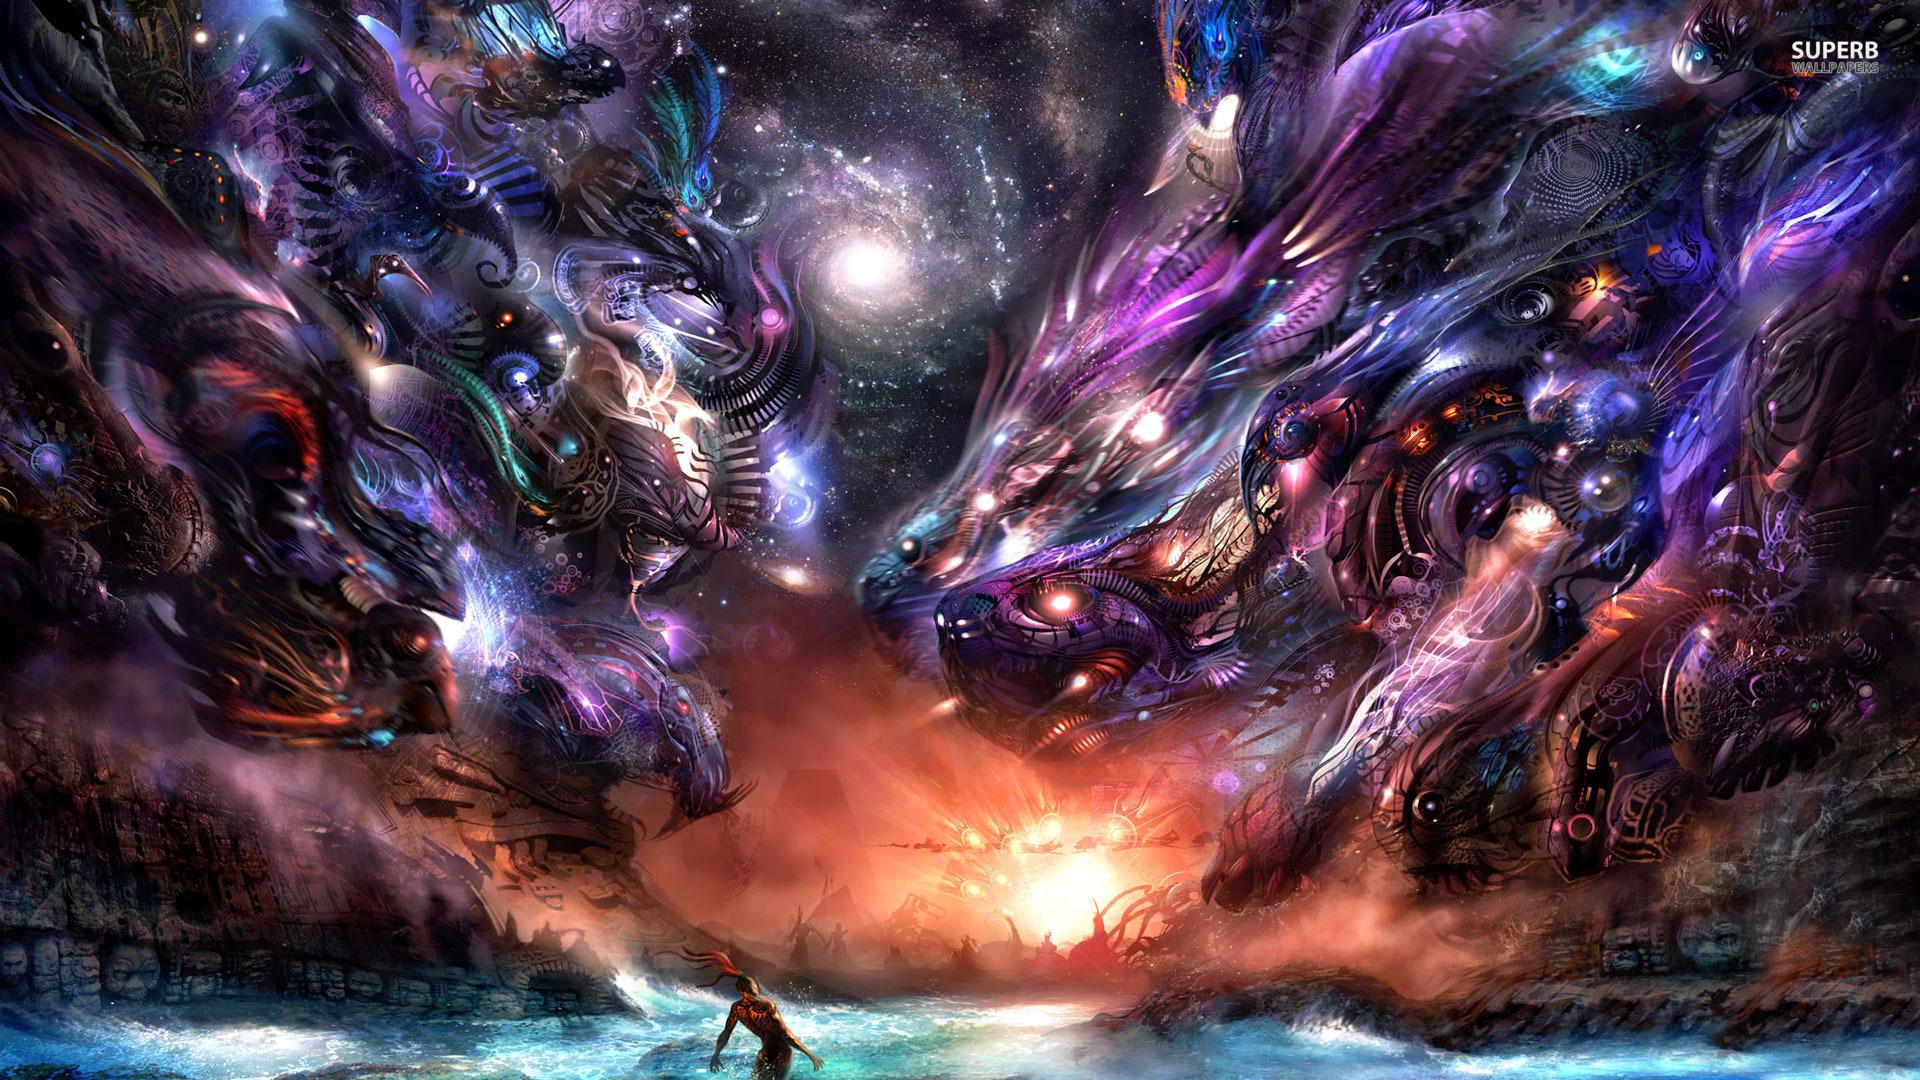 Wonderful Wallpaper Horse Epic - tumblr_static_epic_dragon  Perfect Image Reference_778168.jpg